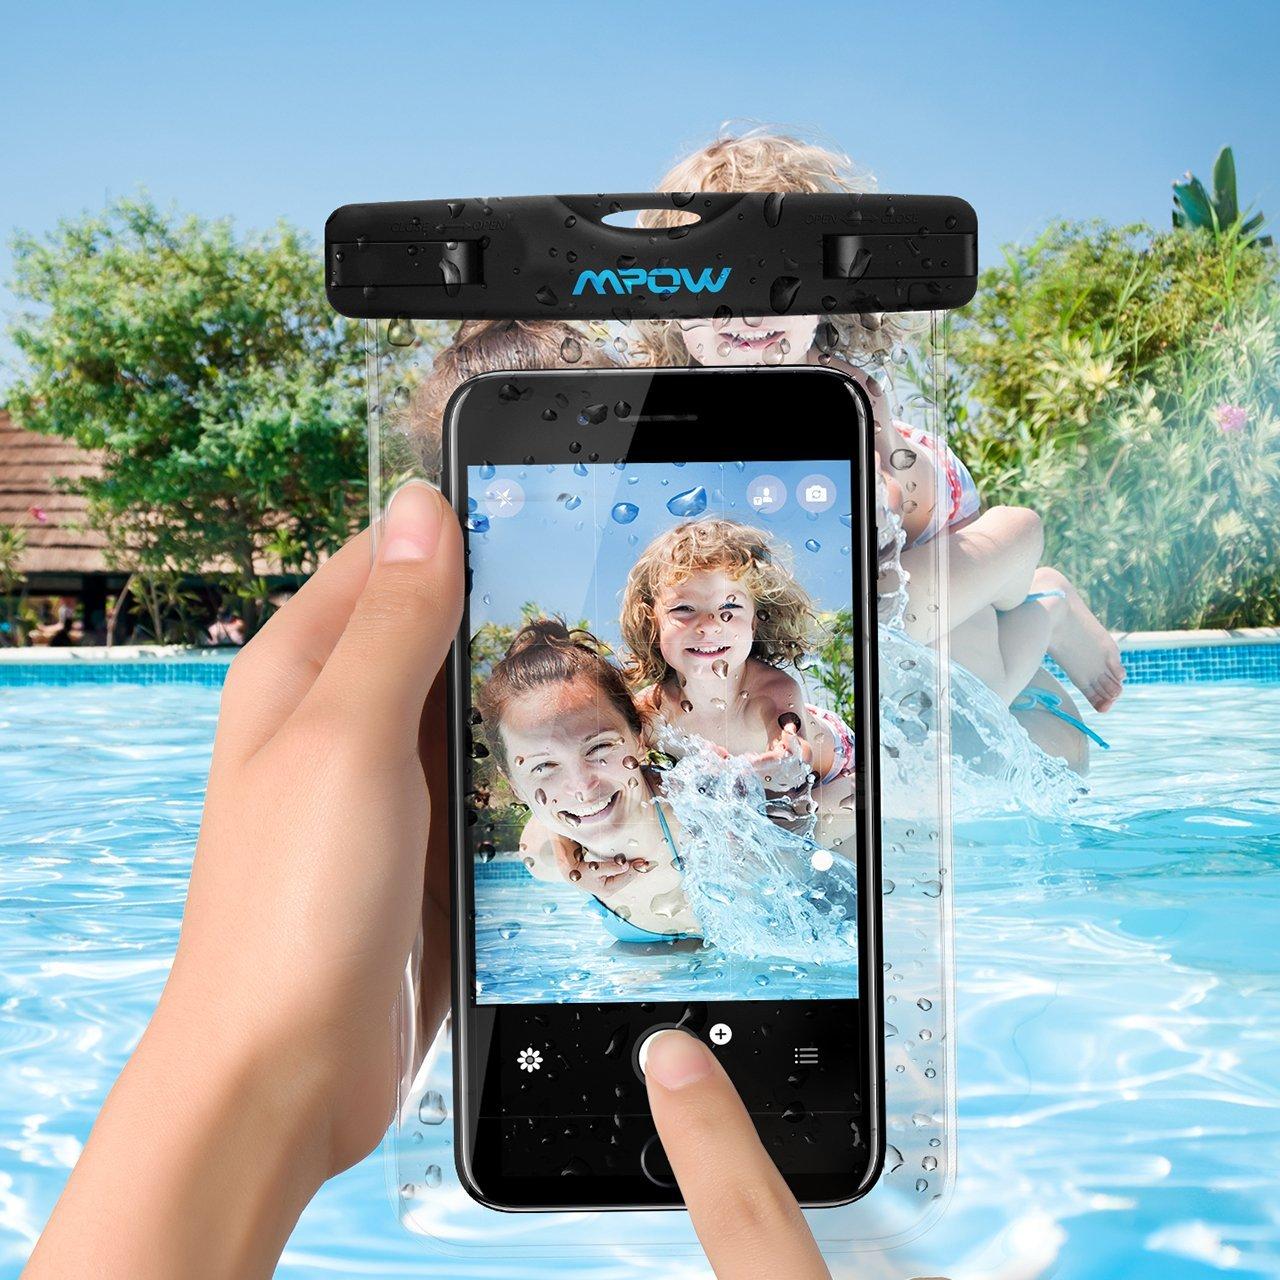 Mpow Waterproof Camera Case, waterproof camera bags, waterproof camera case, waterproof camera backpack